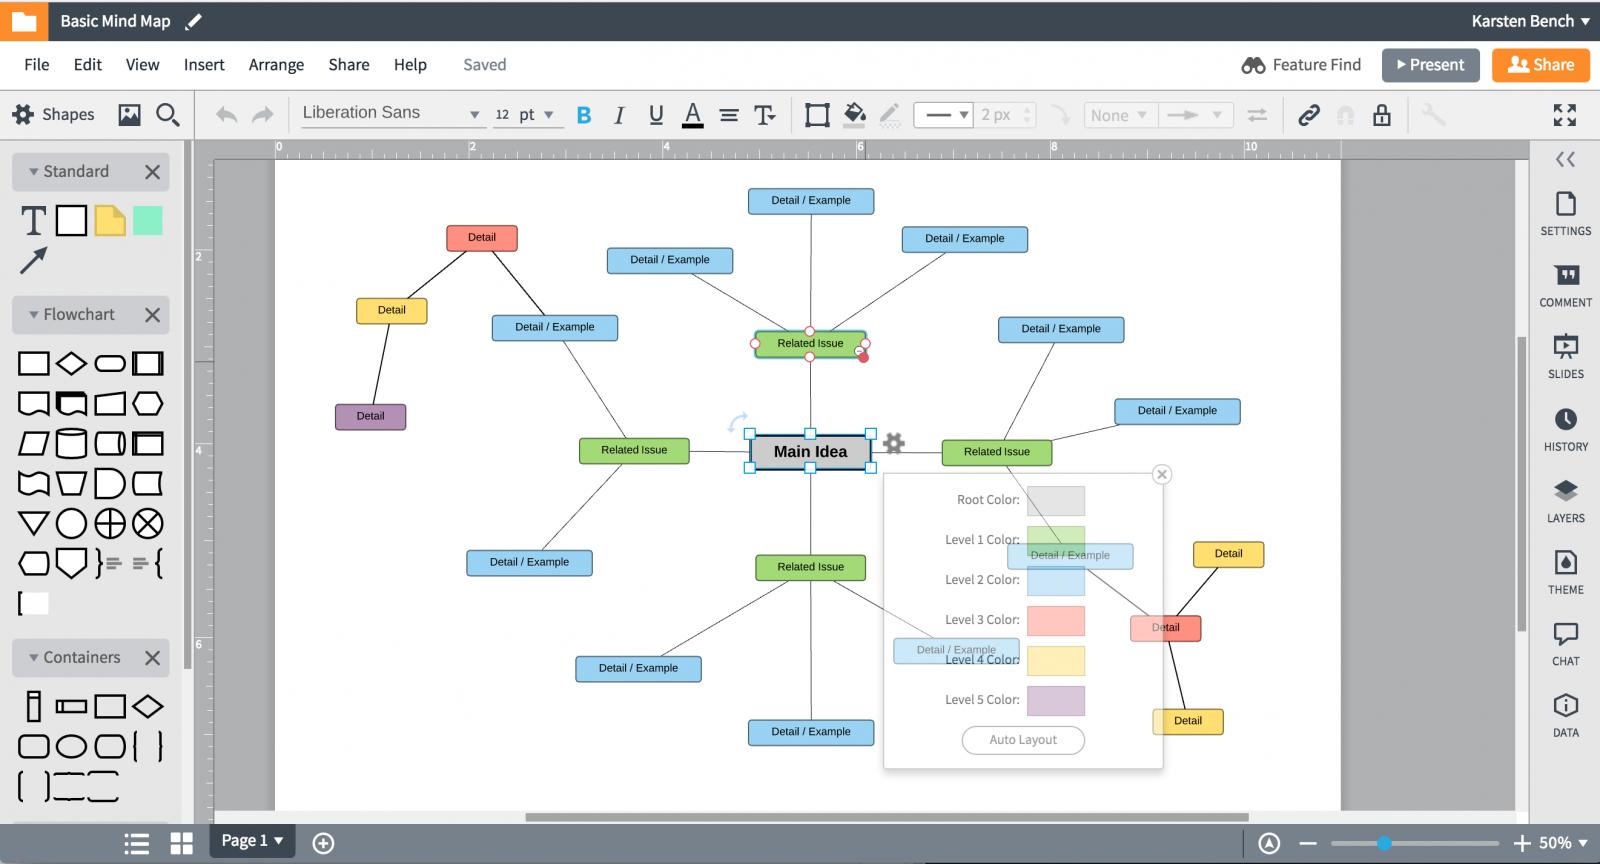 LucidChart (เว็บแอปพลิเคชัน สร้างแผนผัง Mind-Mapping บนเว็บ